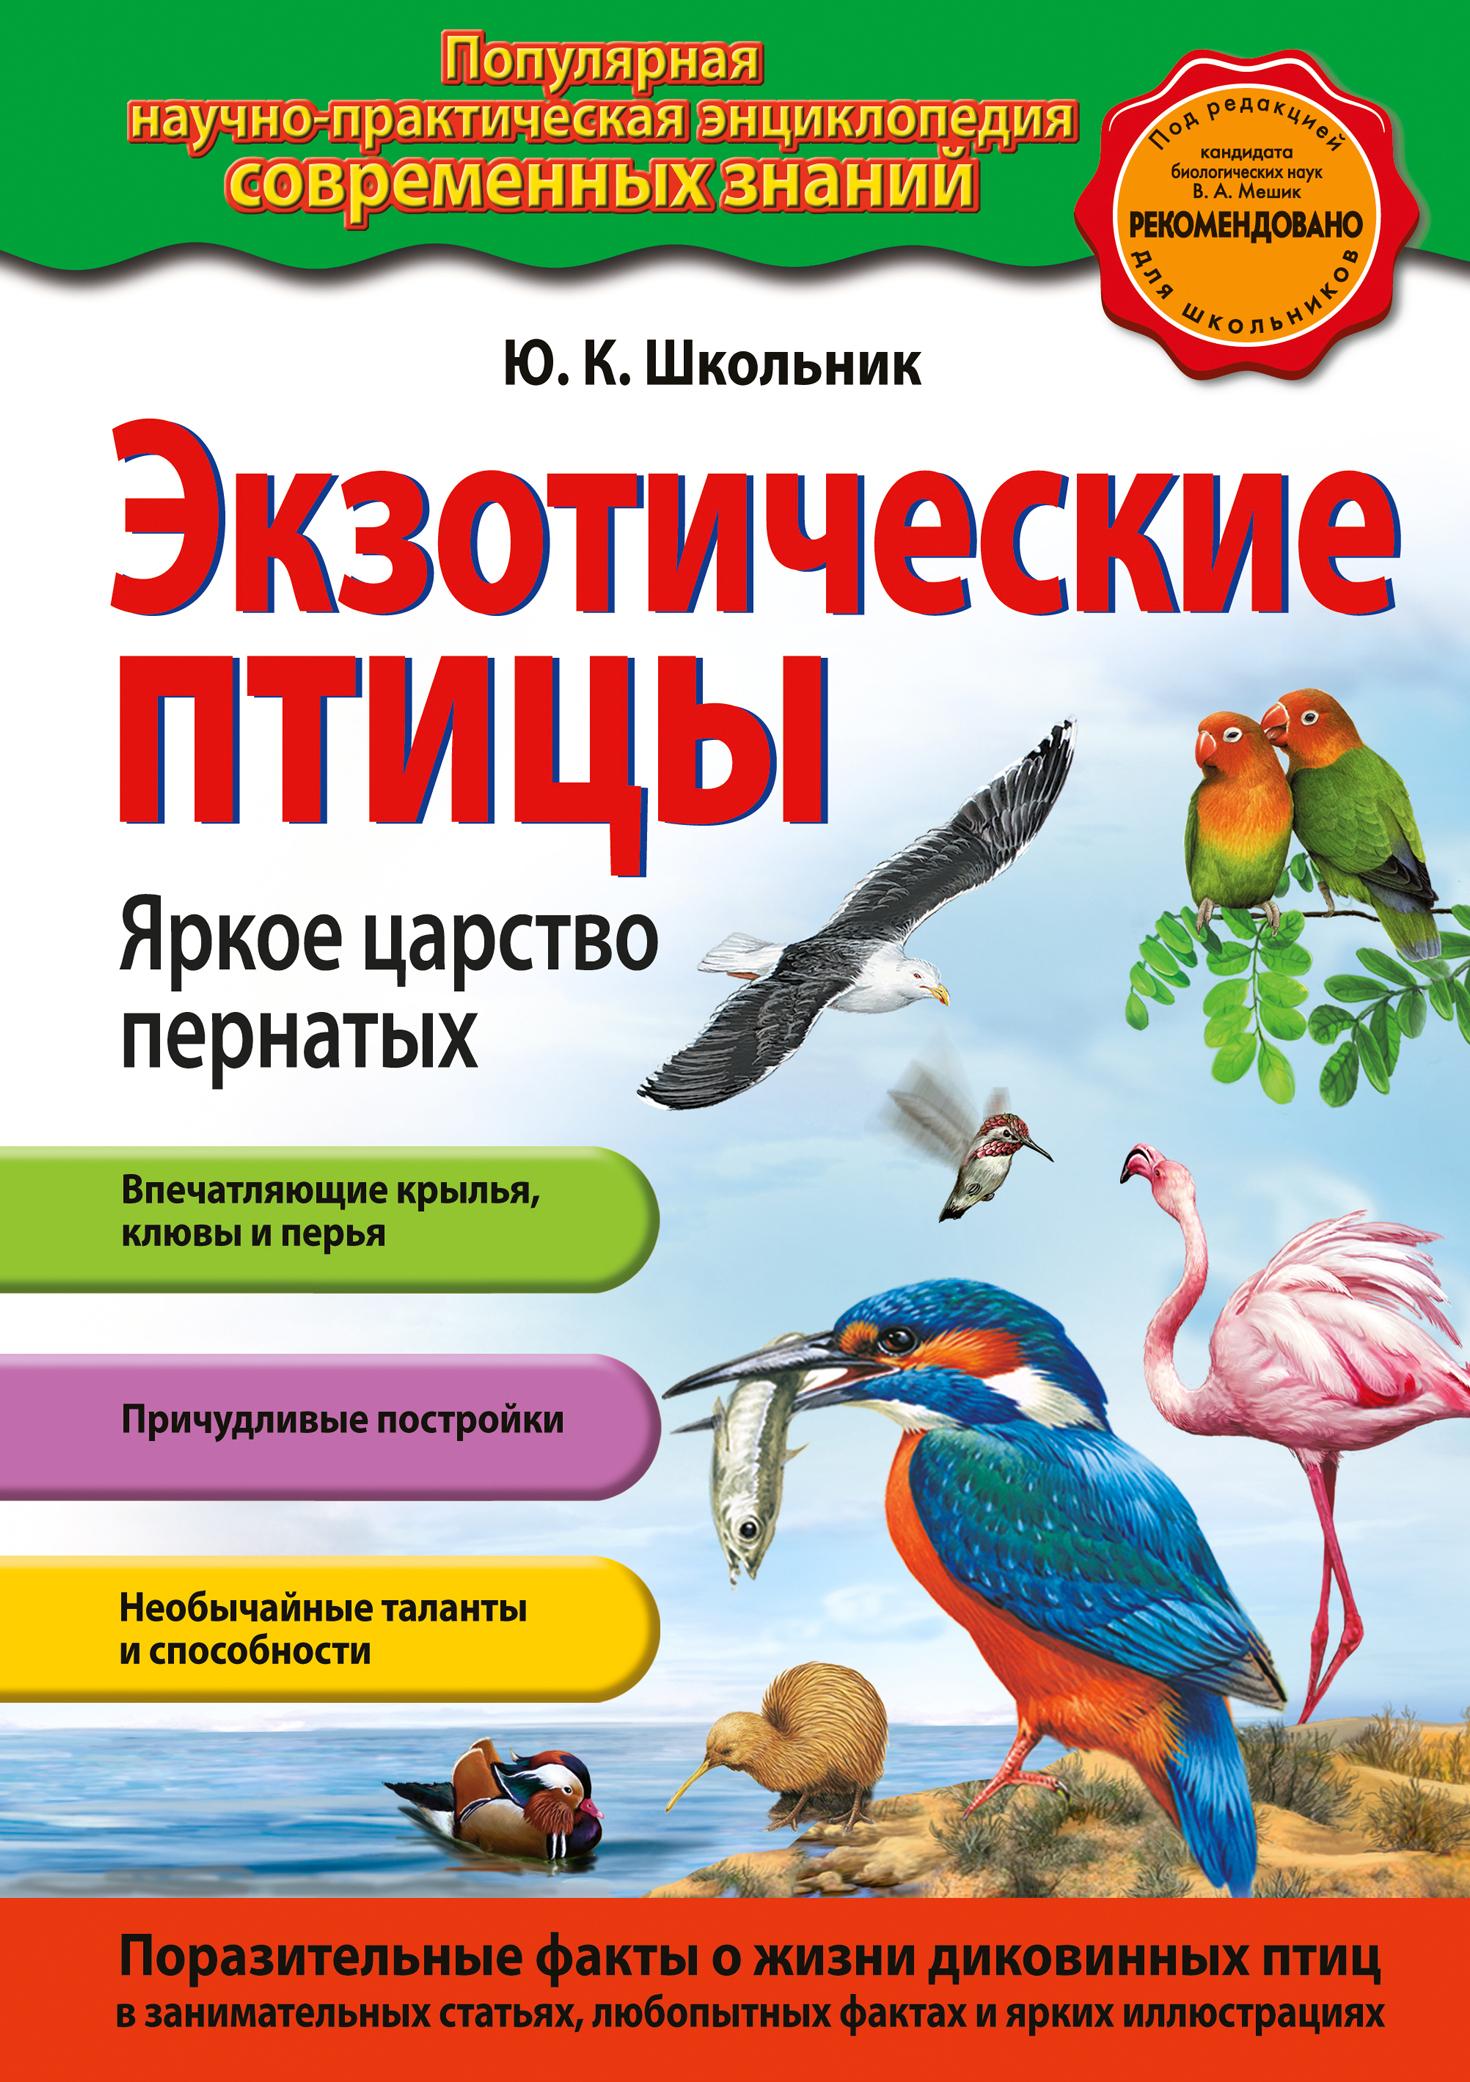 Экзотические птицы. Яркое царство пернатых